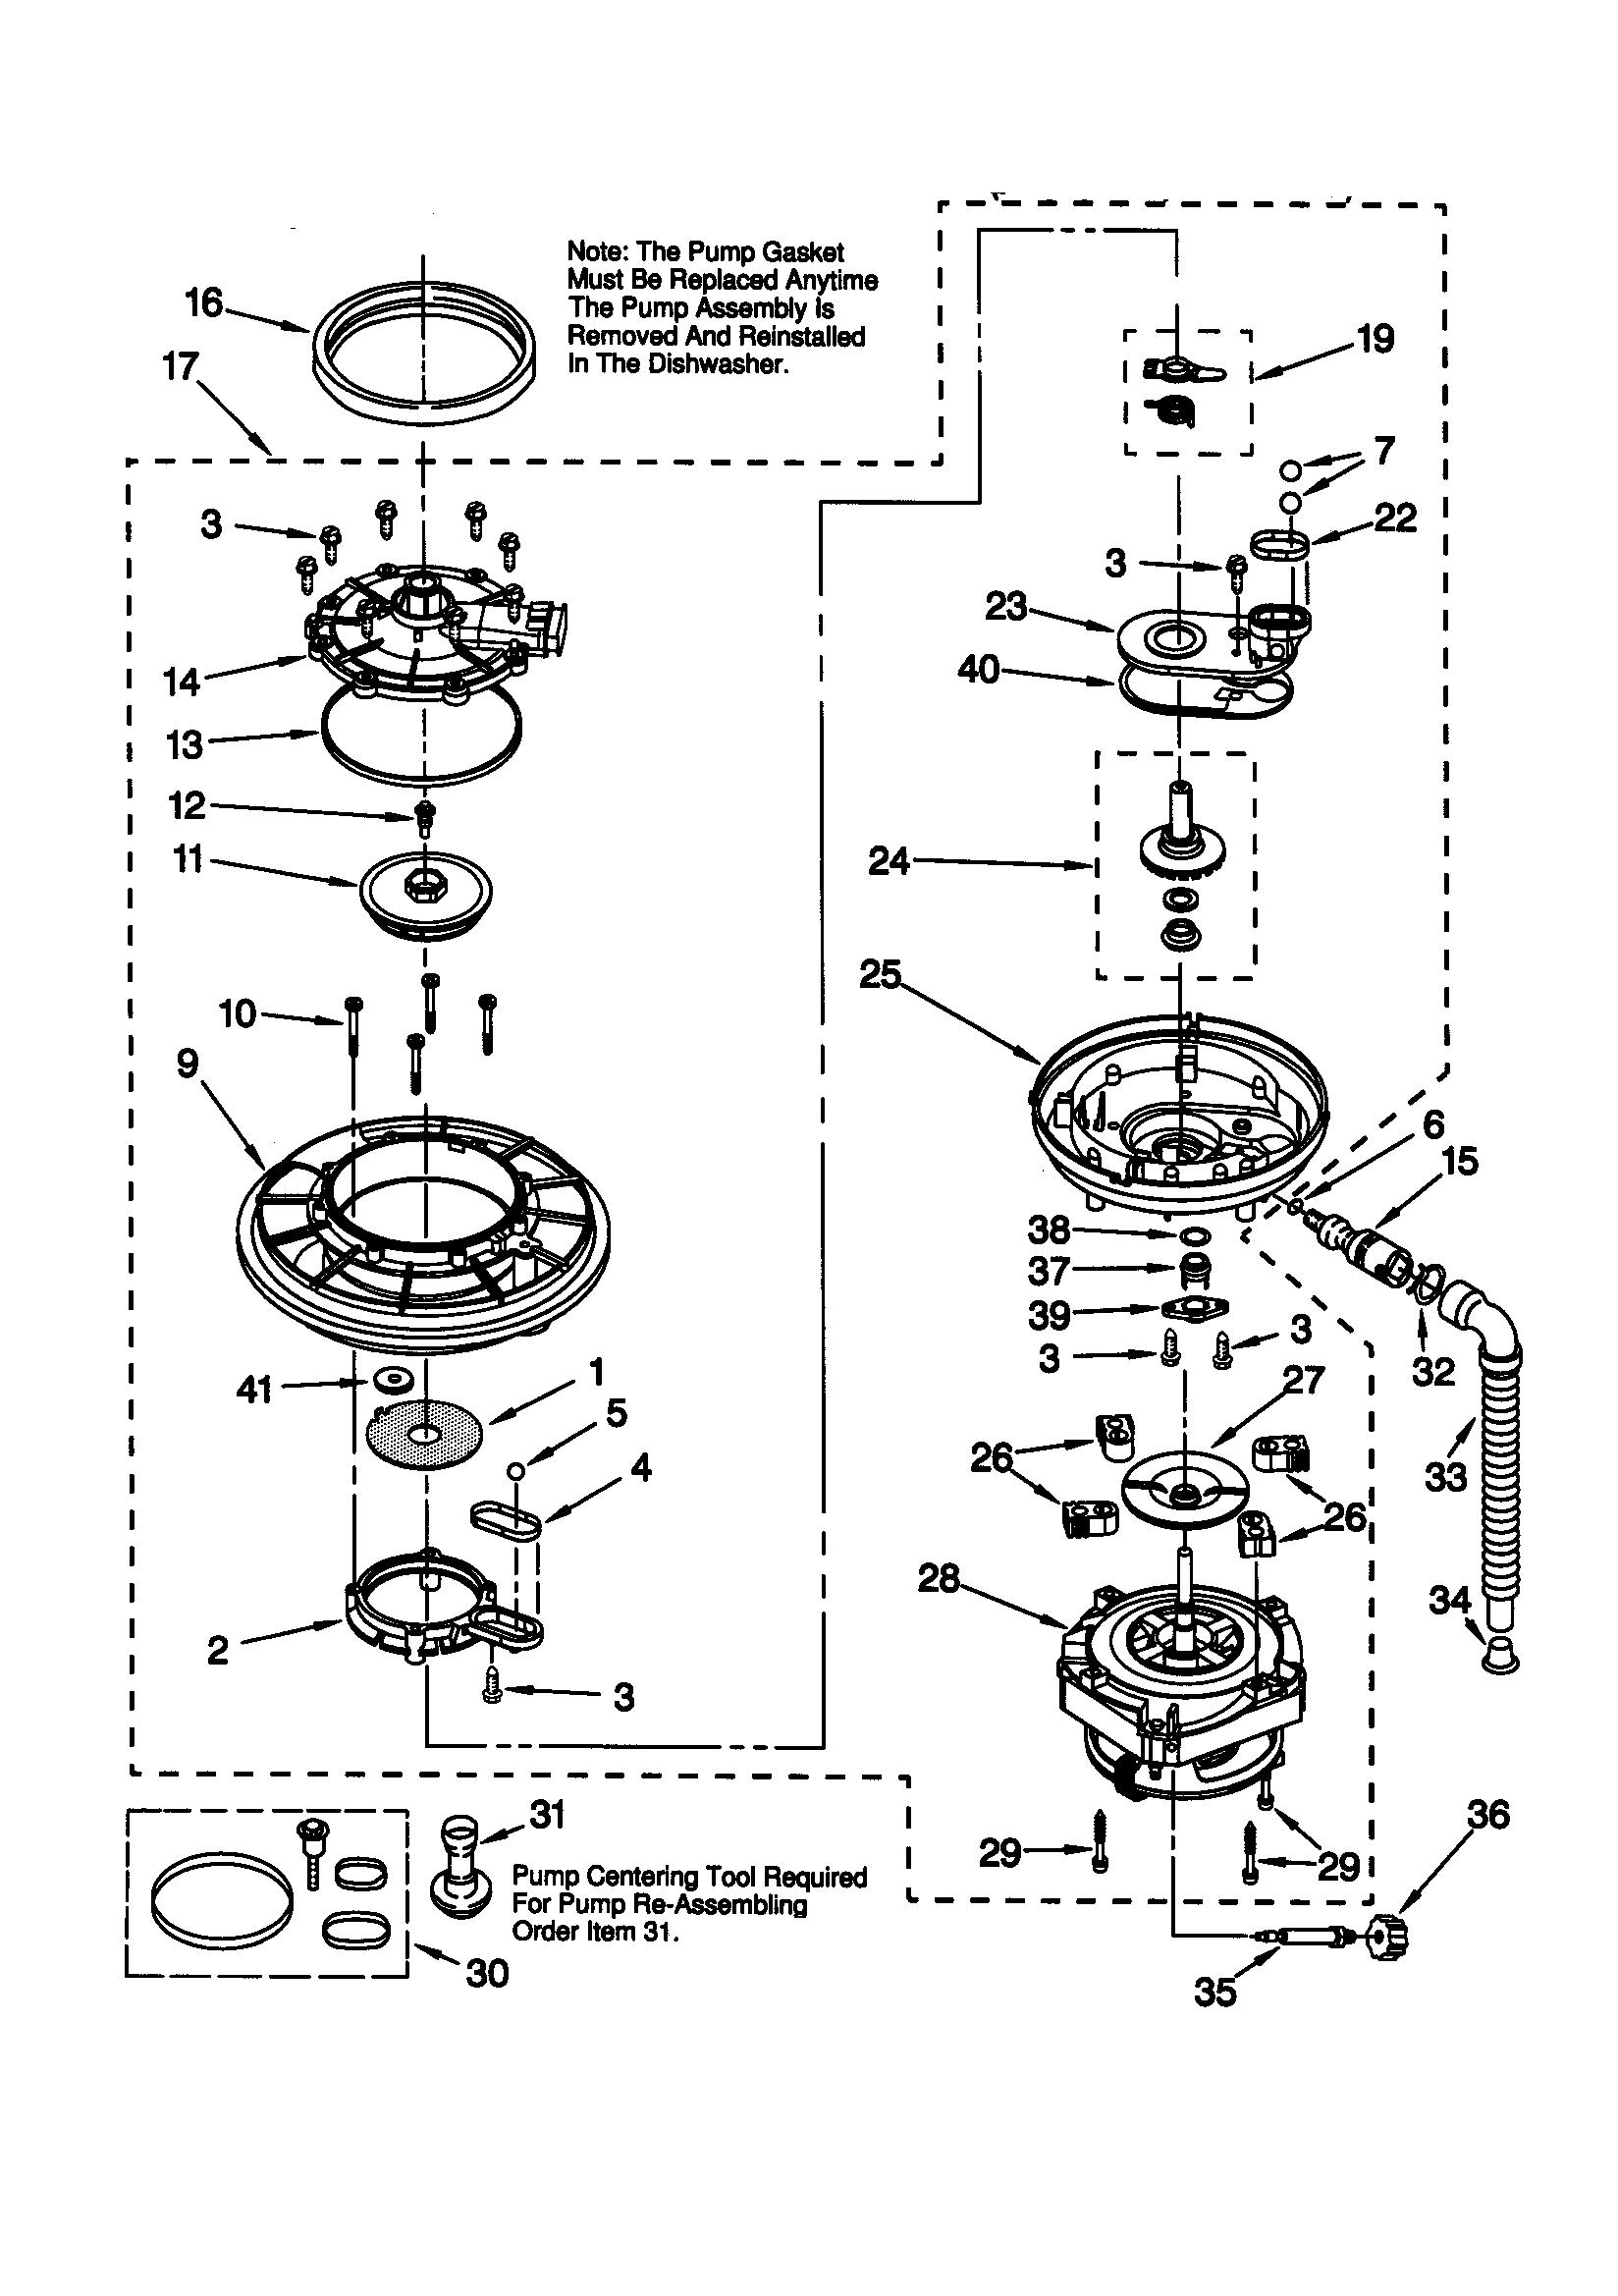 Motor Schematic Diagrams